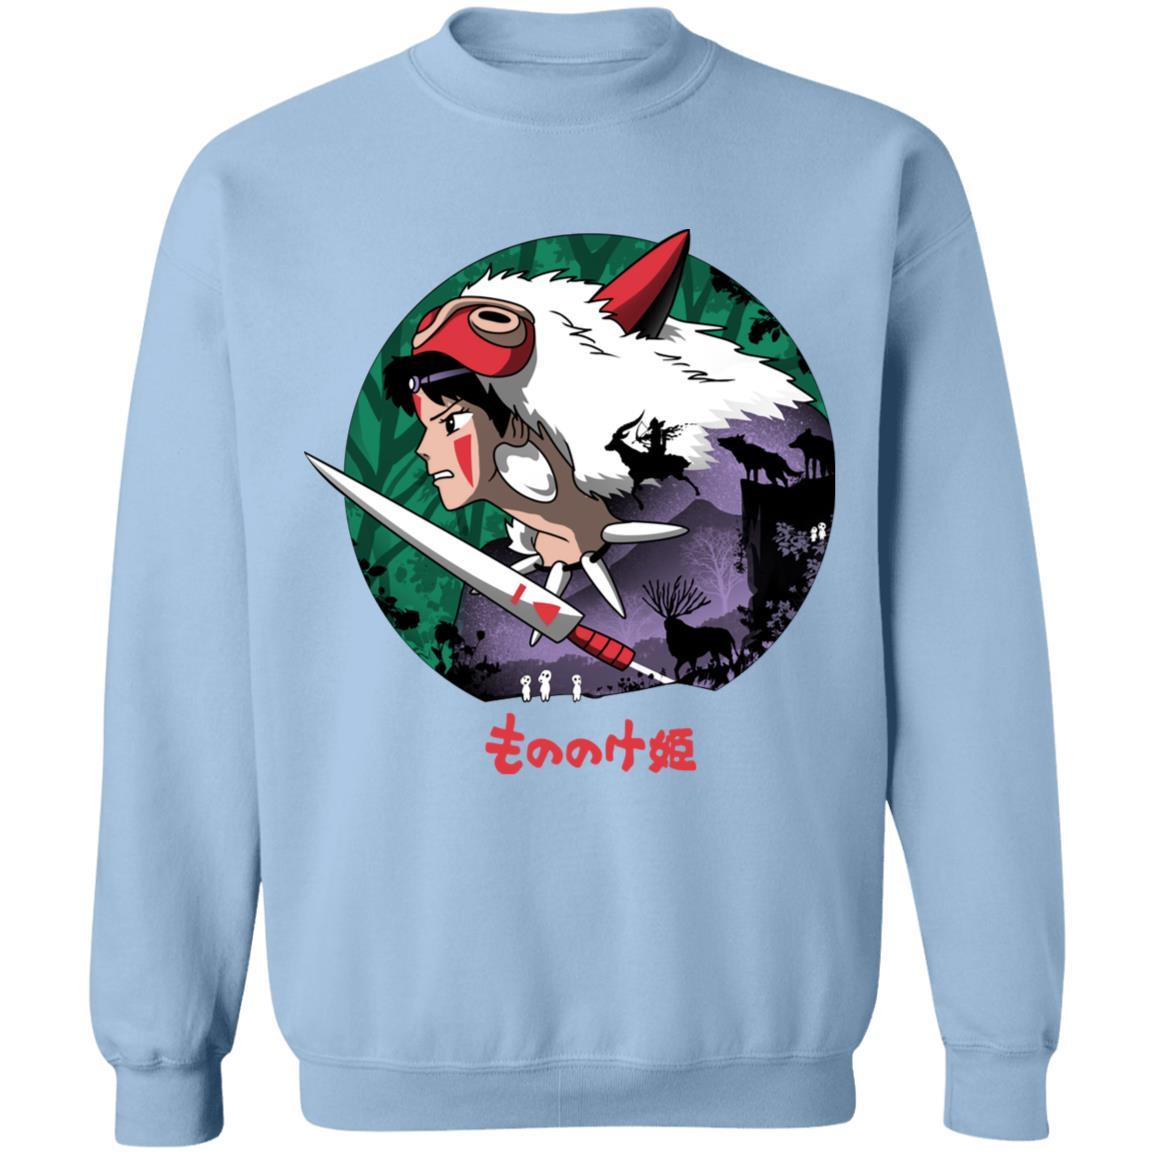 Princess Mononoke's Journey Sweatshirt